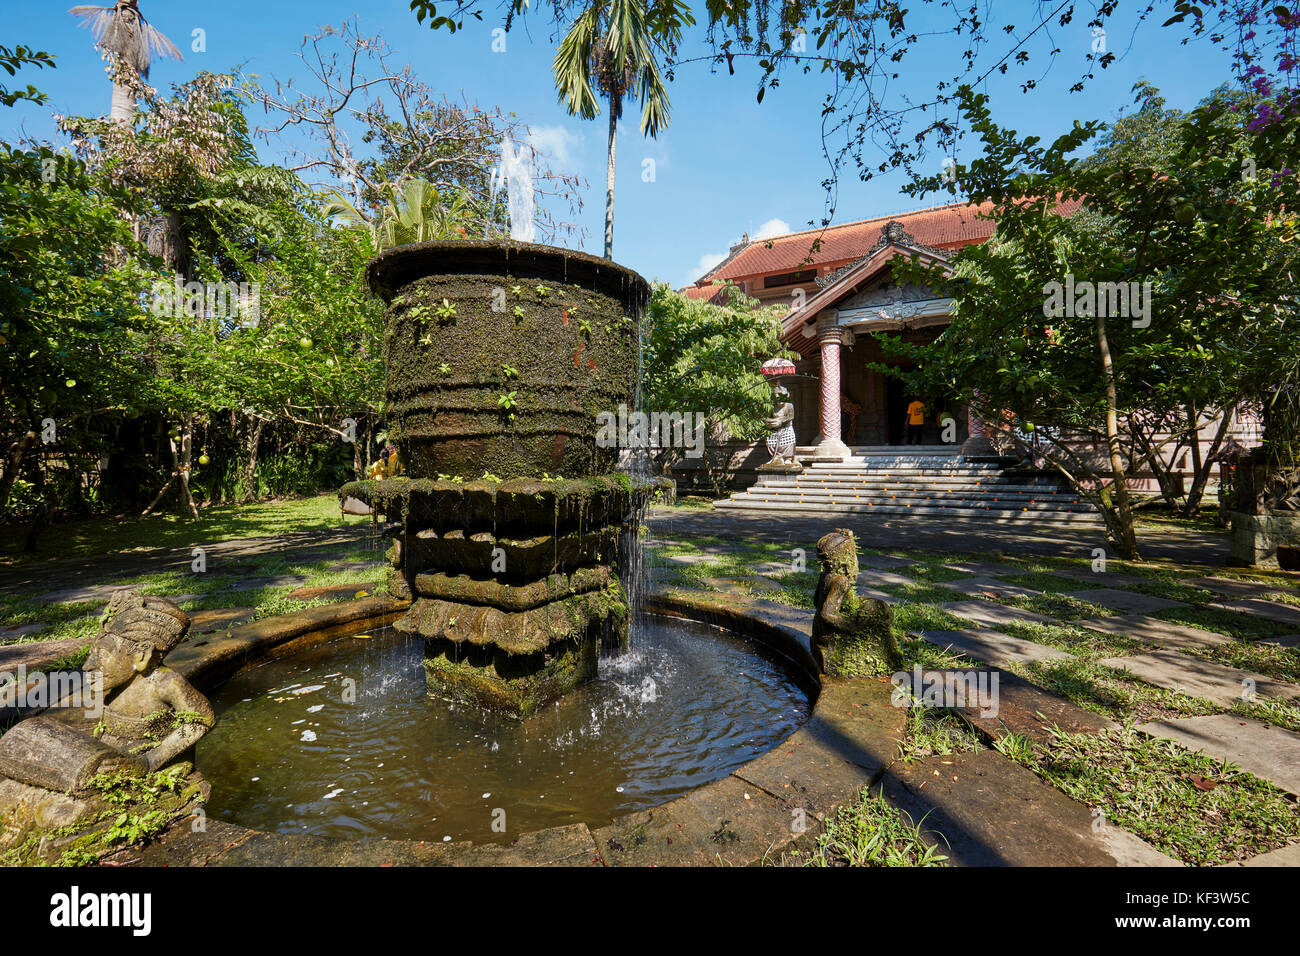 Garden of the Agung Rai Museum of Art (ARMA). Ubud, Bali, Indonesia. - Stock Image